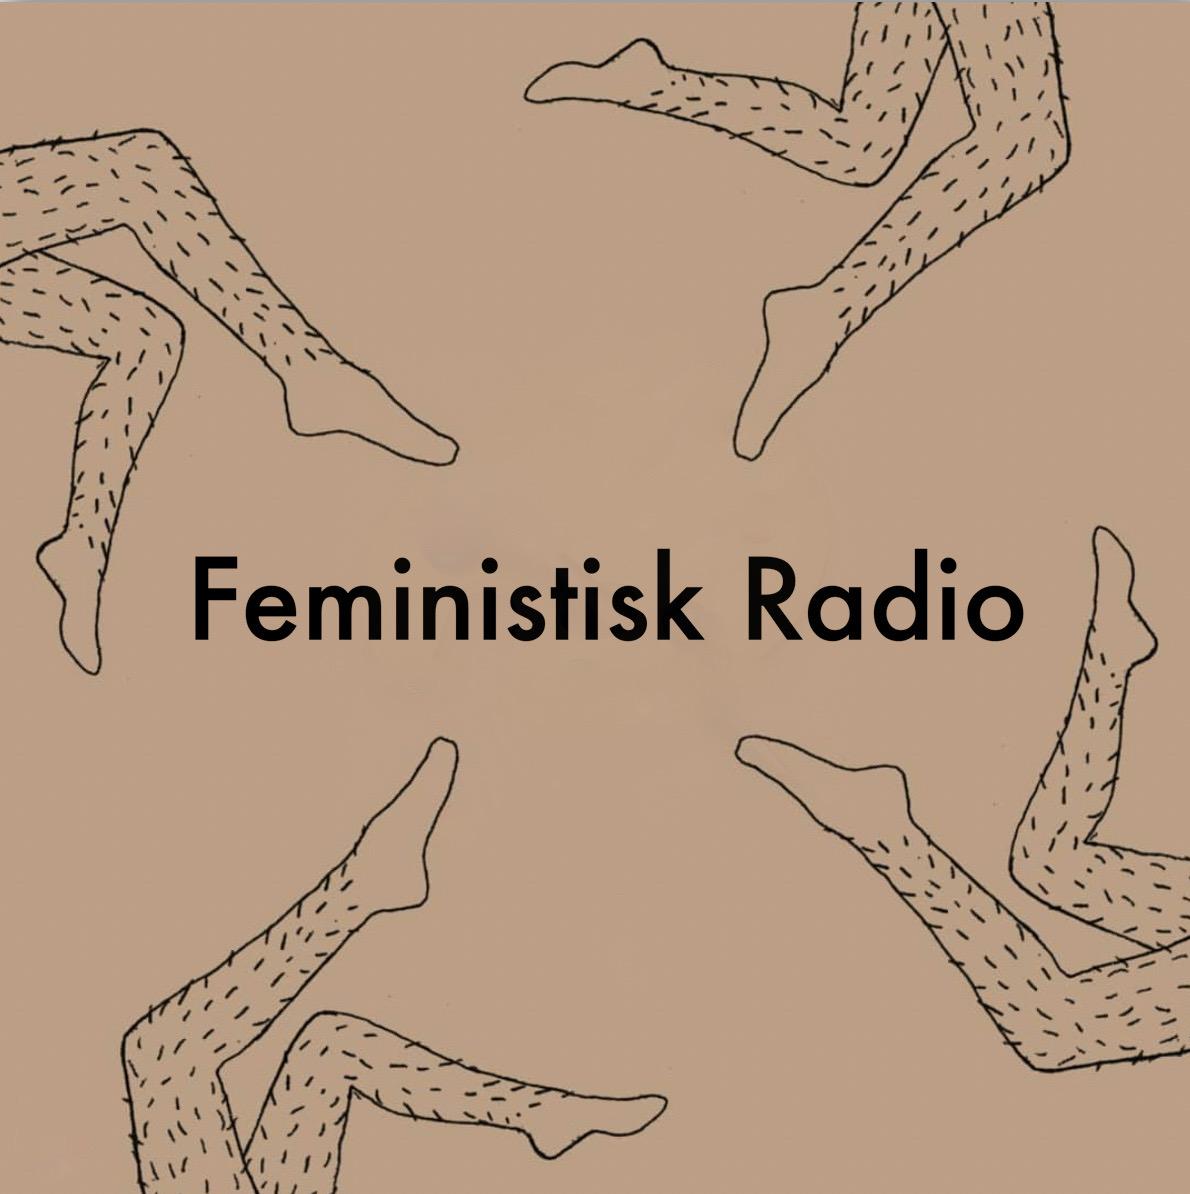 feministisk radio